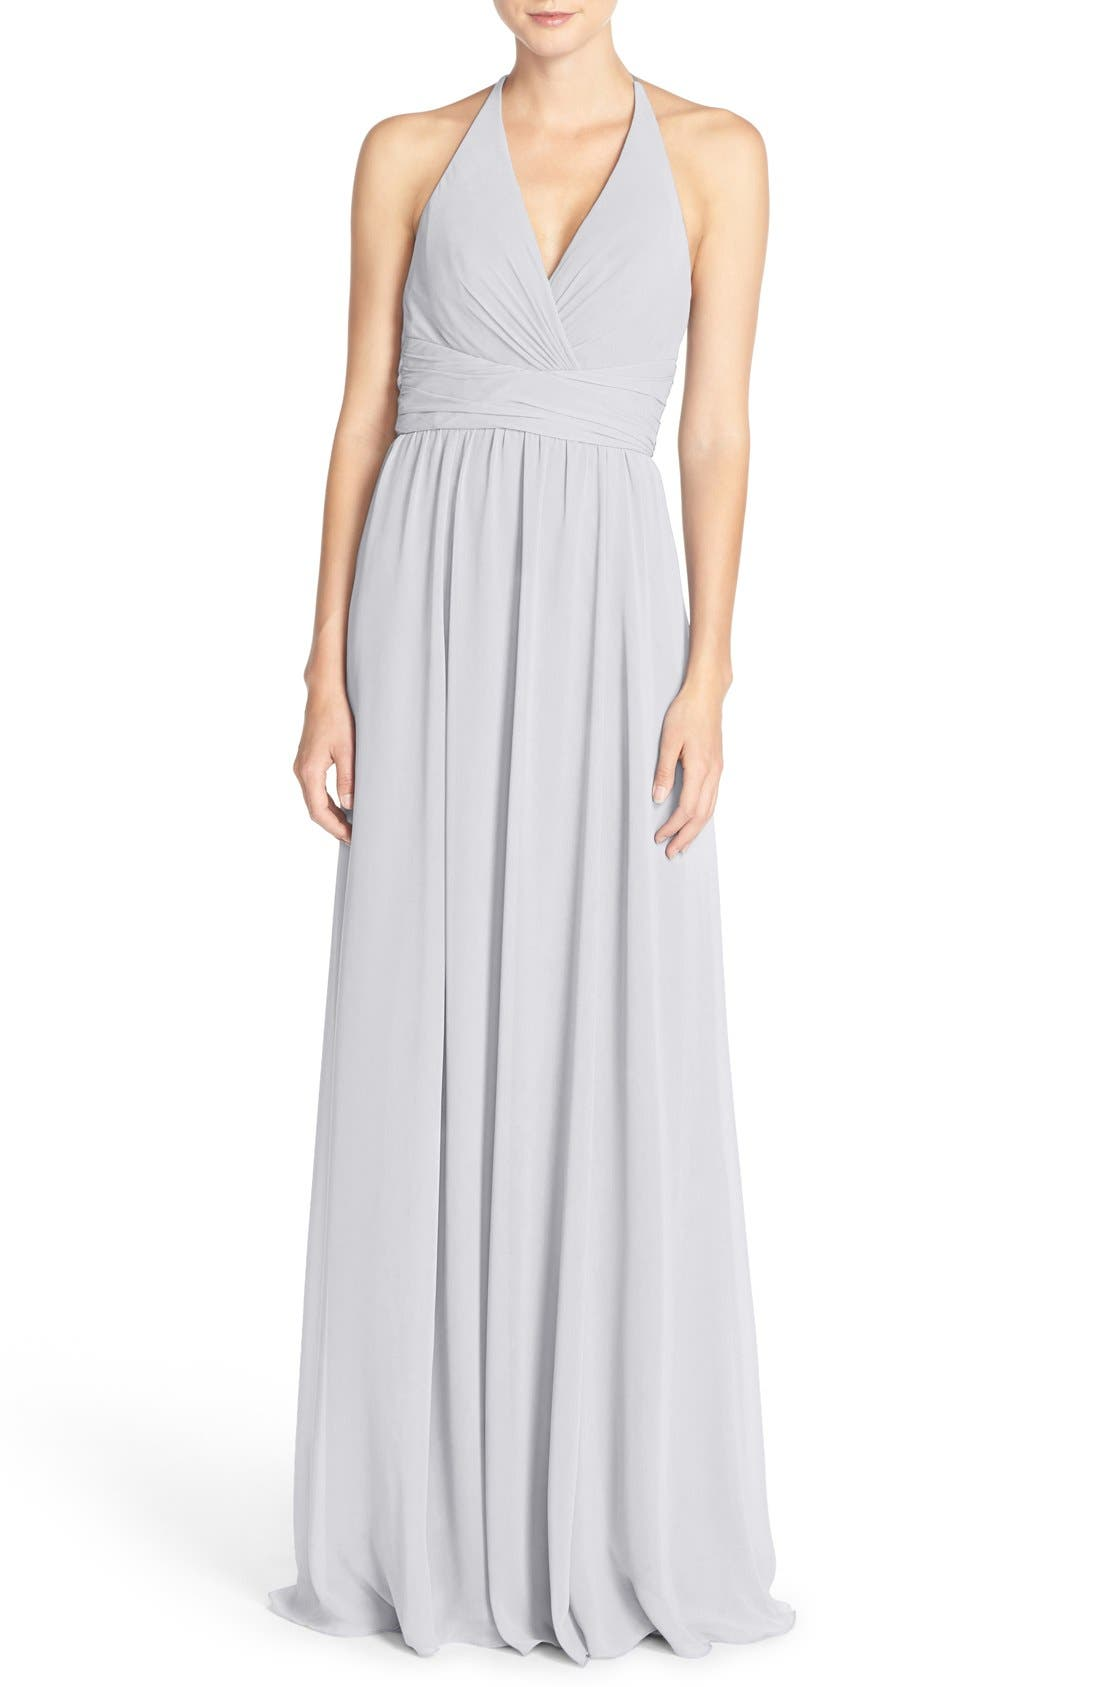 Main Image - Amsale 'Jennifer' V-Neck Chiffon Halter Gown